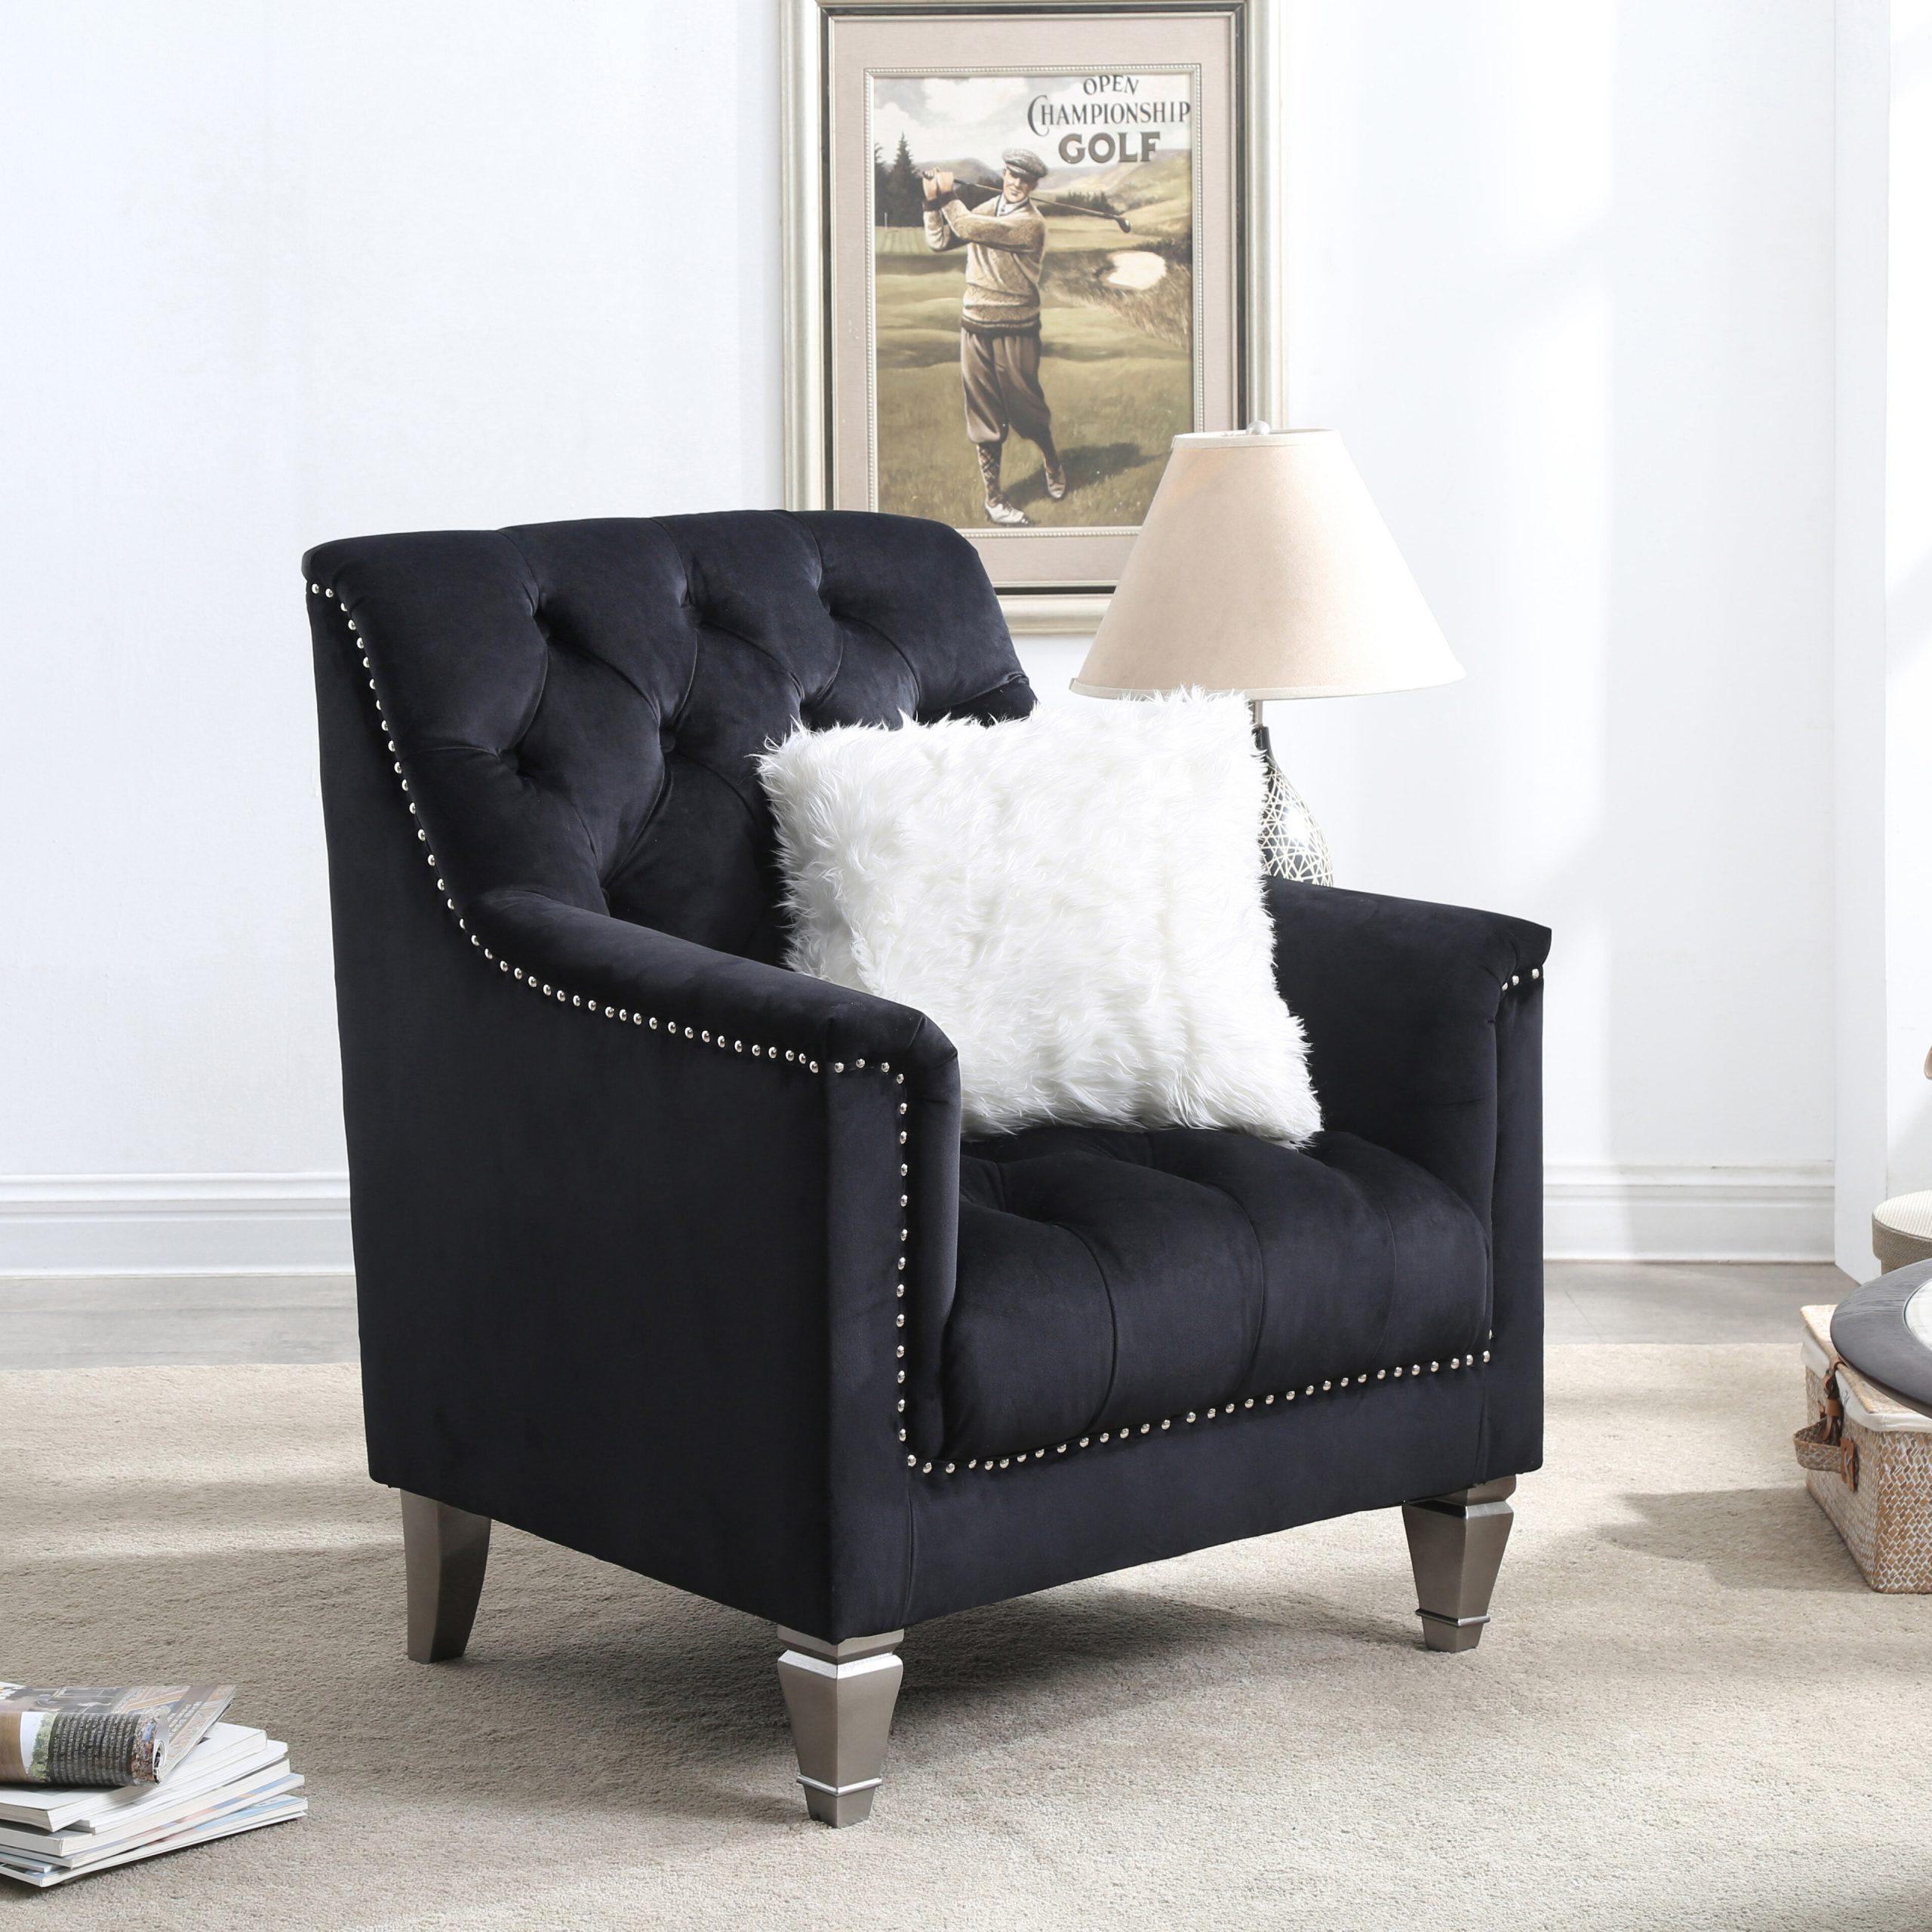 "Davina 31"" W Tufted Velvet Armchair With Regard To Didonato Tufted Velvet Armchairs (View 7 of 15)"